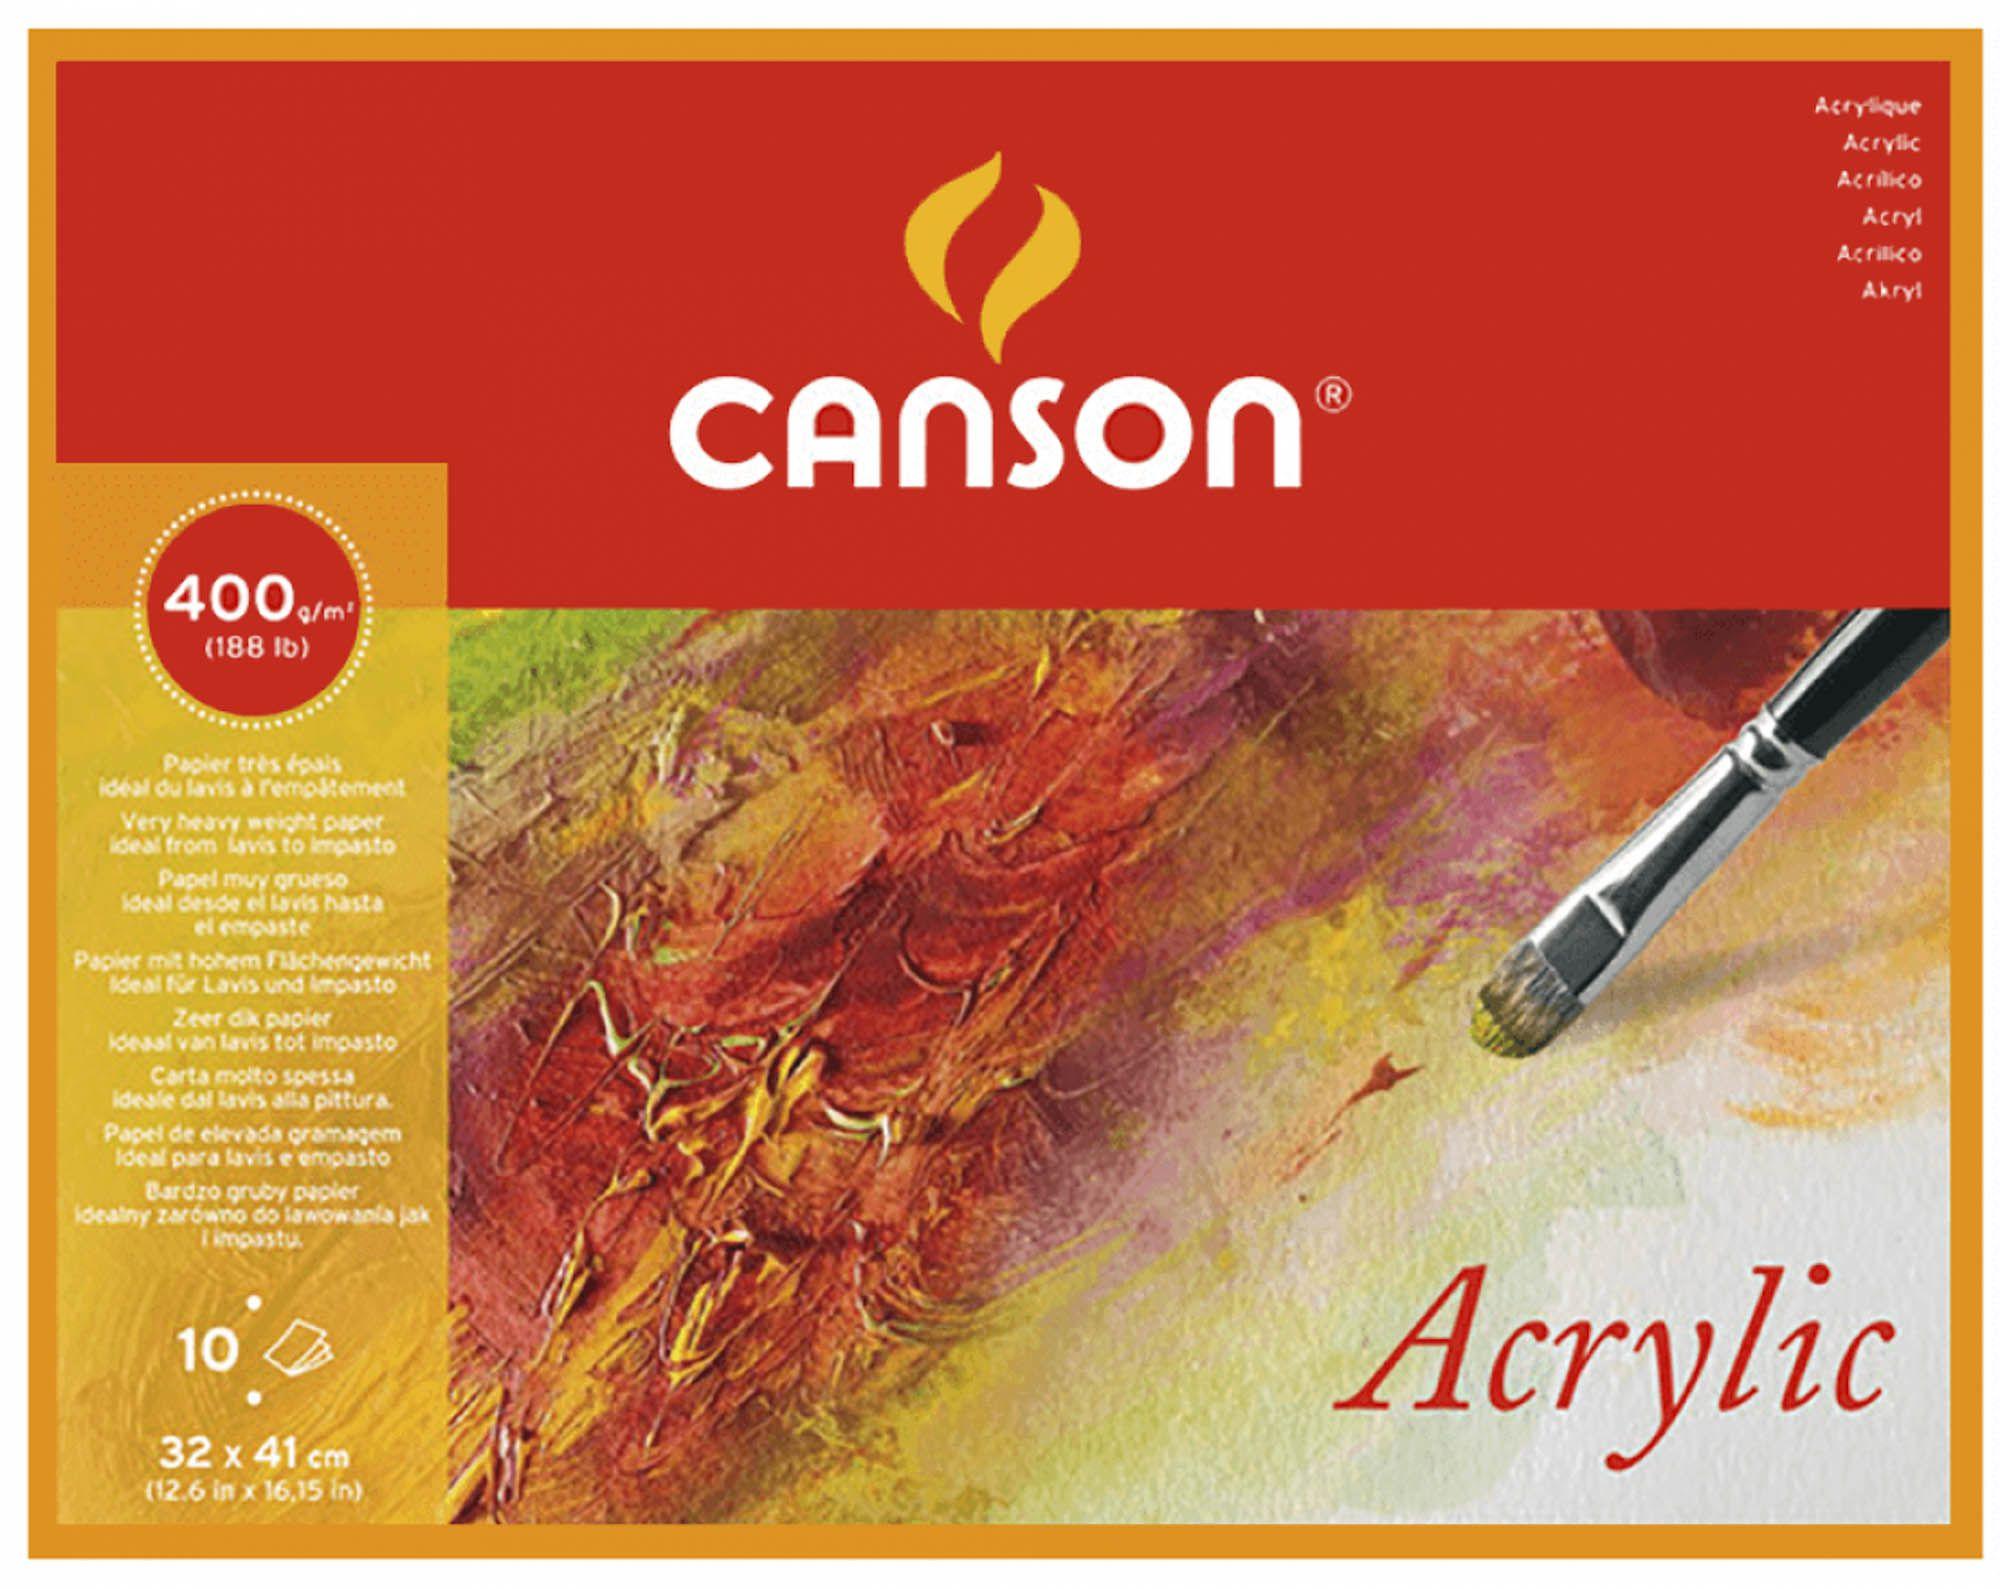 Bloco Canson Acrylic  A3 400g com 10 Folhas